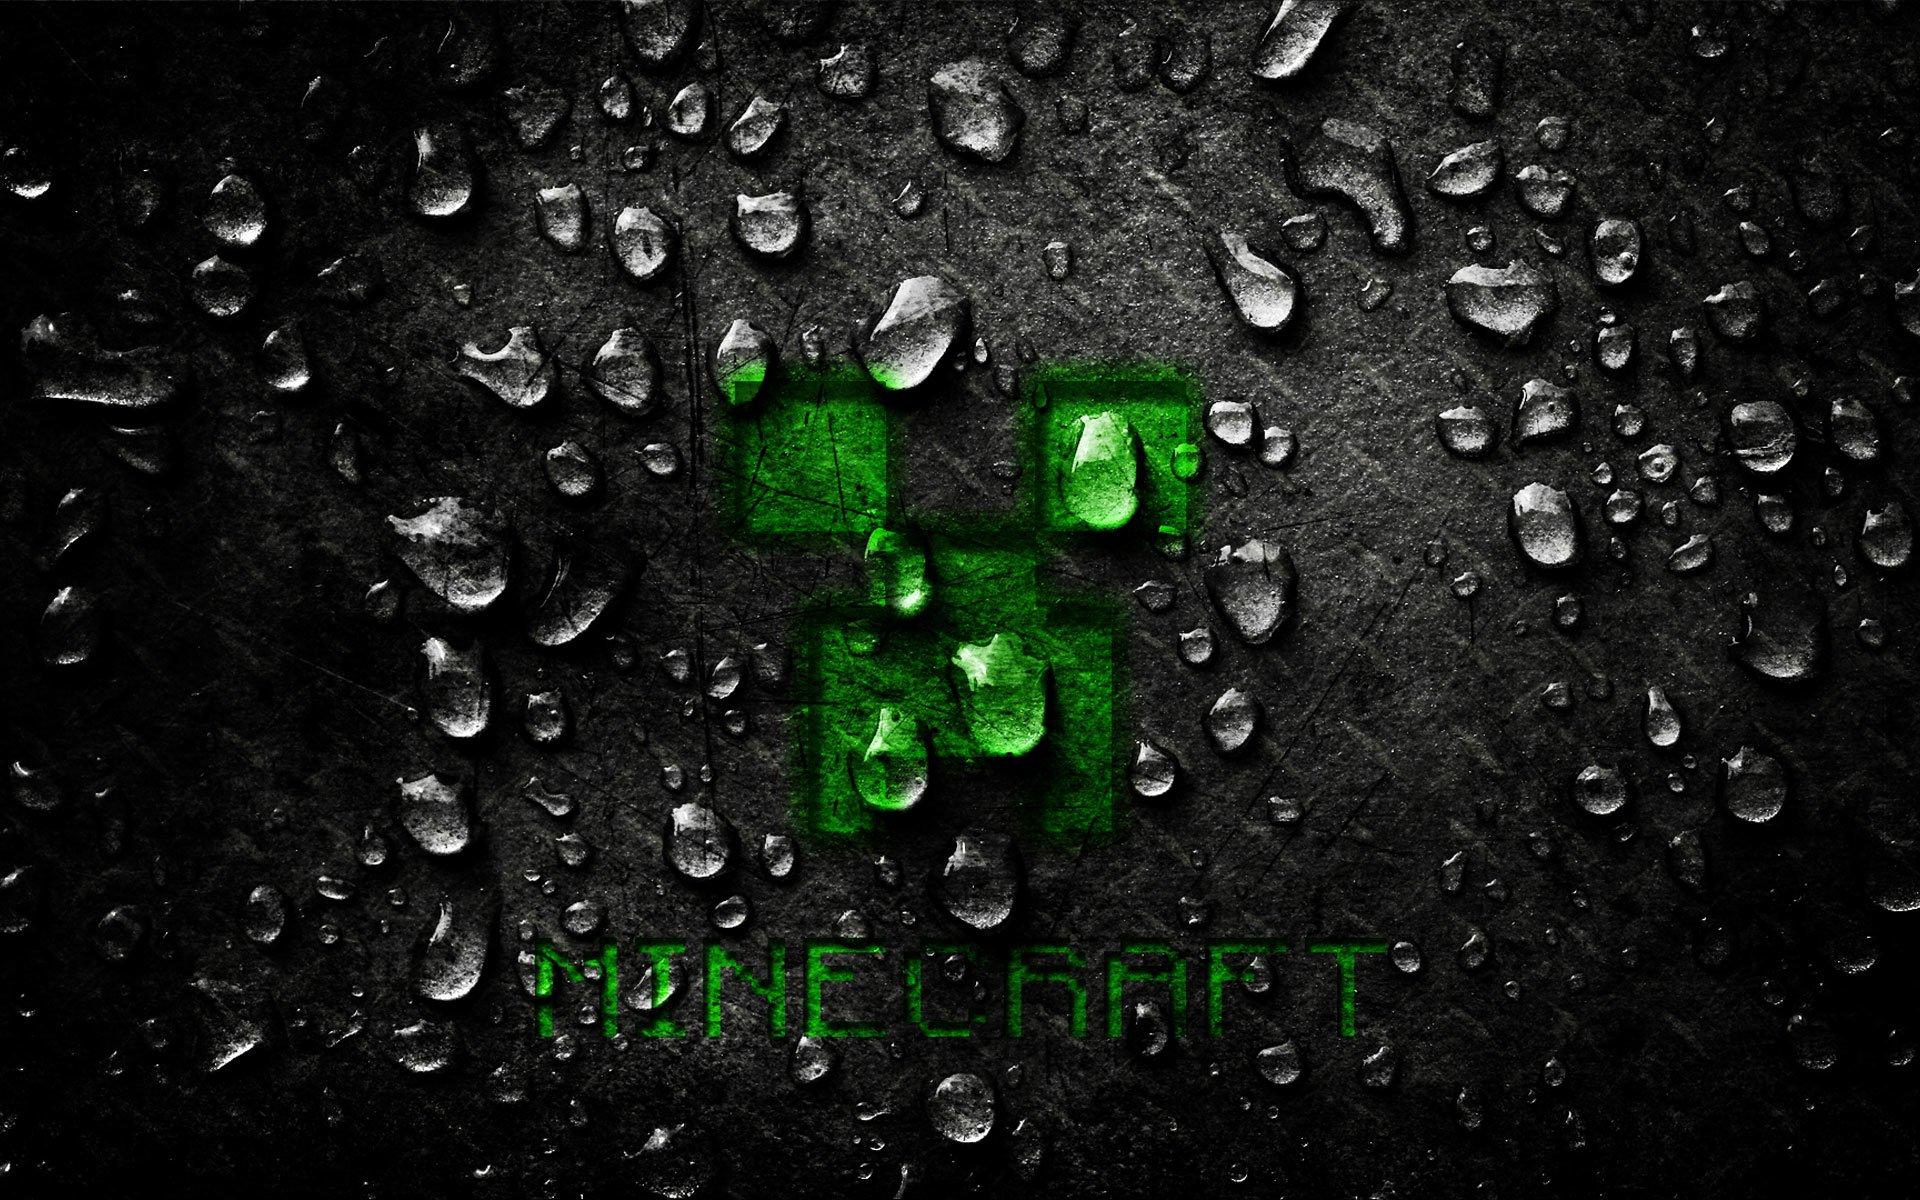 Iphone 5 Minecraft Wallpaper Minecraft Full Hd Fondo De Pantalla And Fondo De